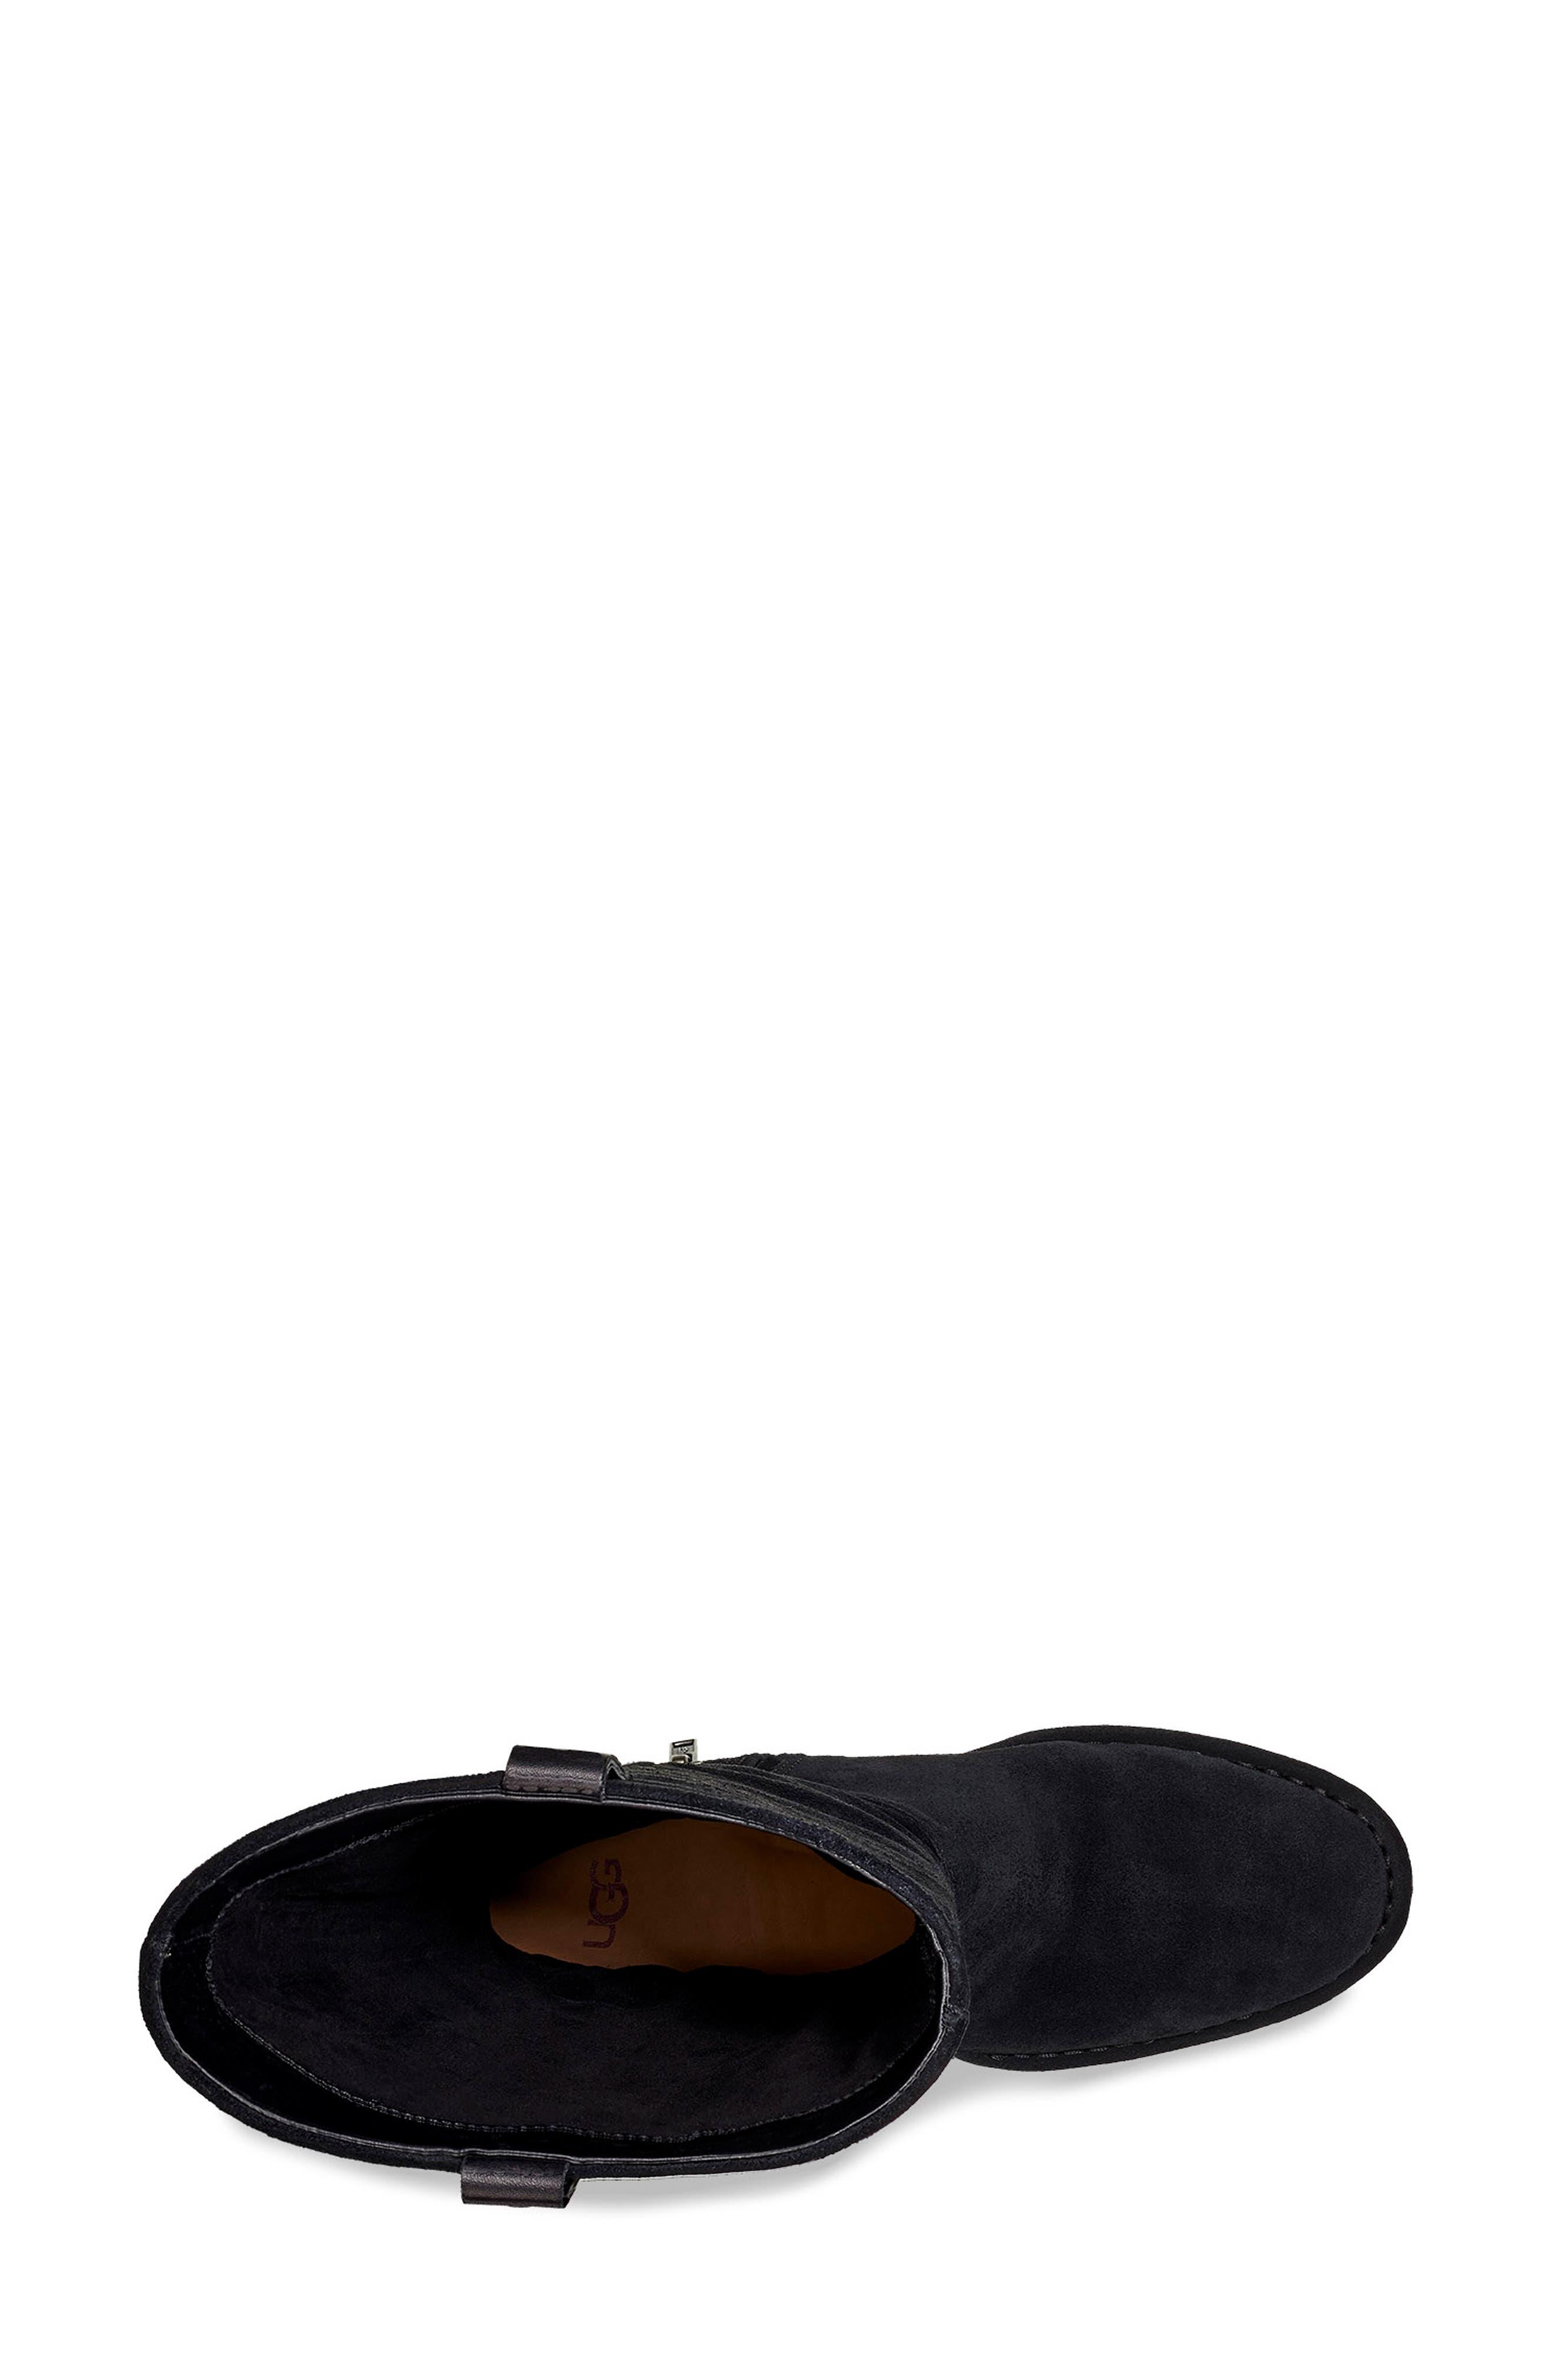 UGG Arana Knee High Leather Boot